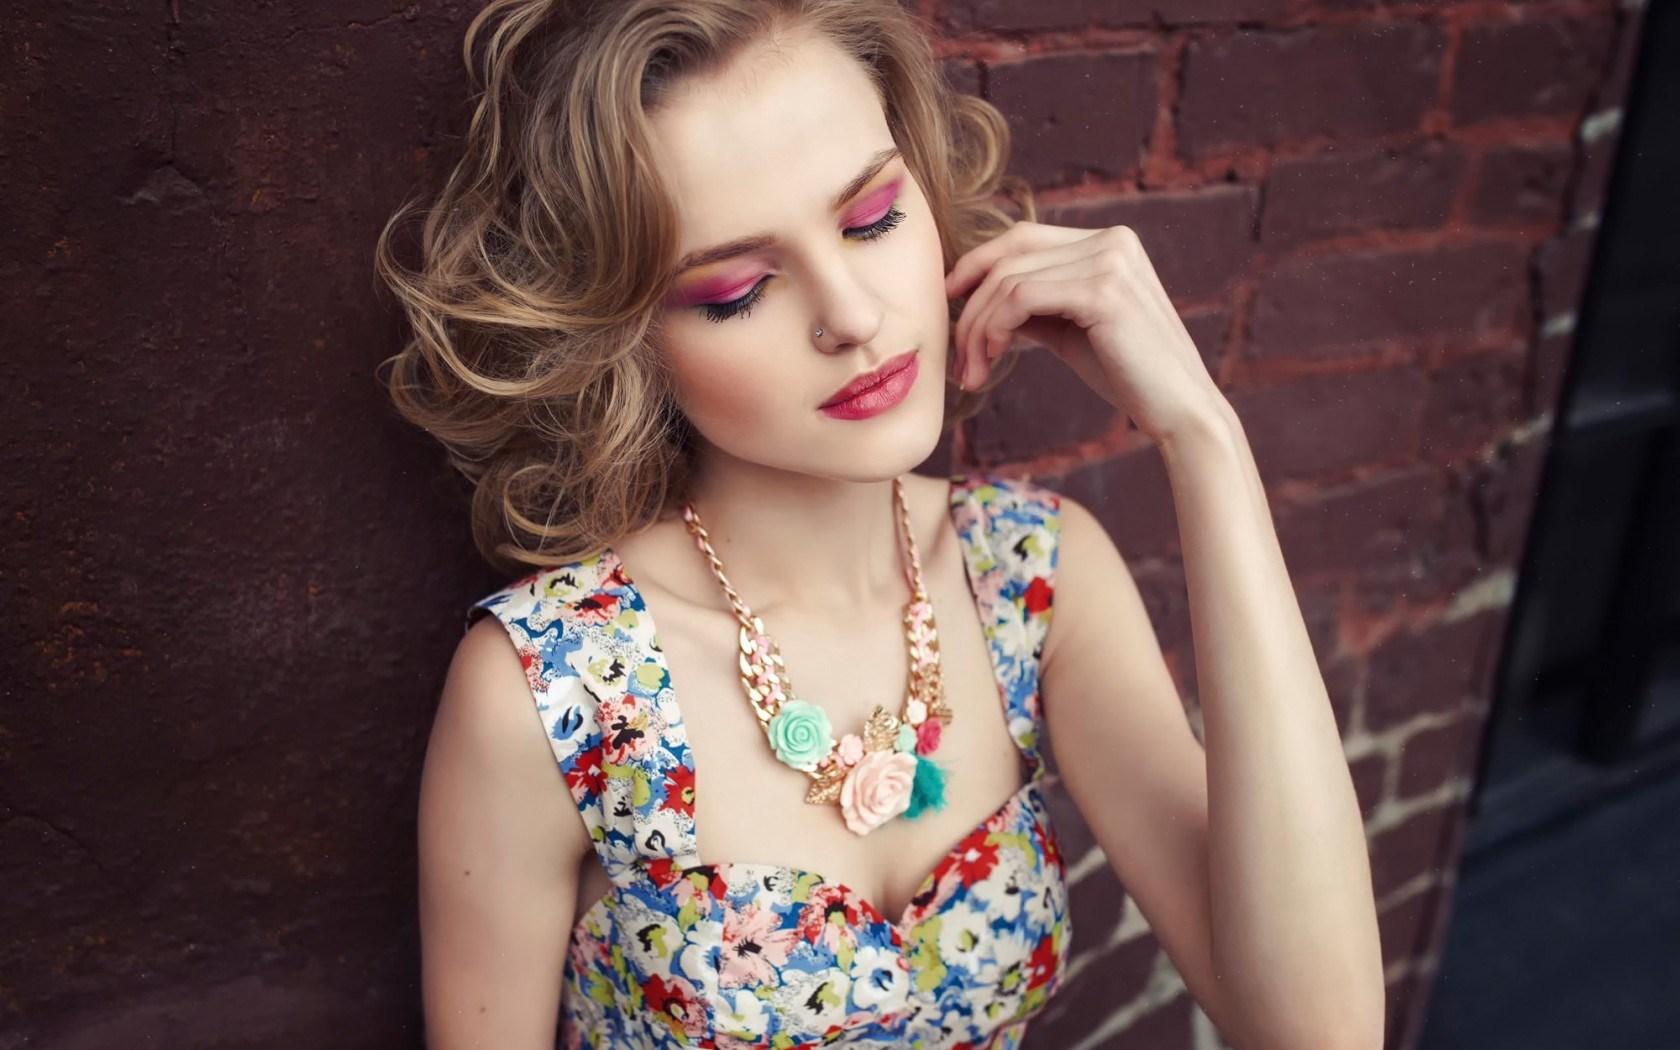 hot models 14 - Urbasm